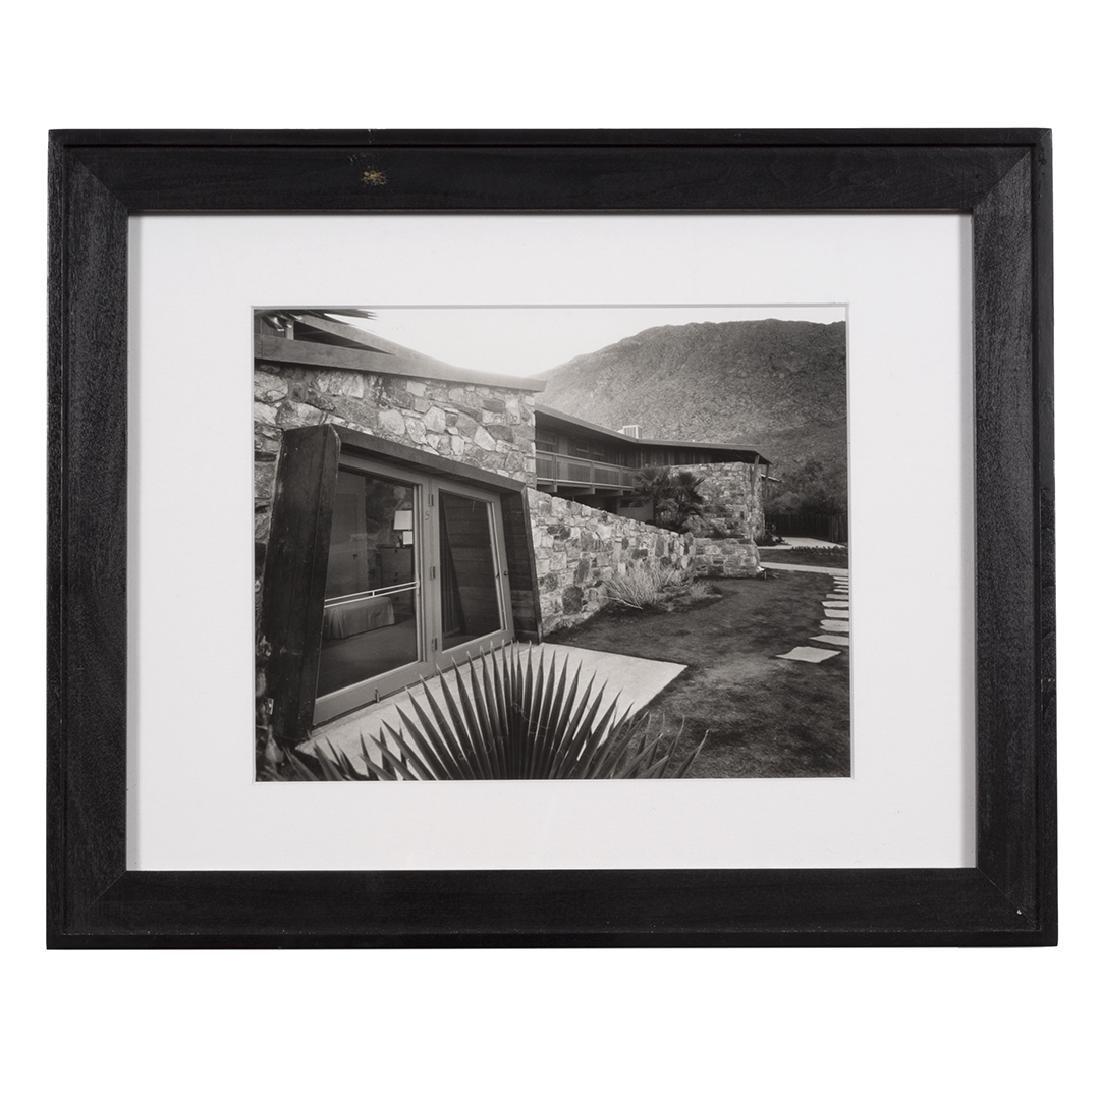 Julius Shulman William F. Cody Photographs (5) - 5